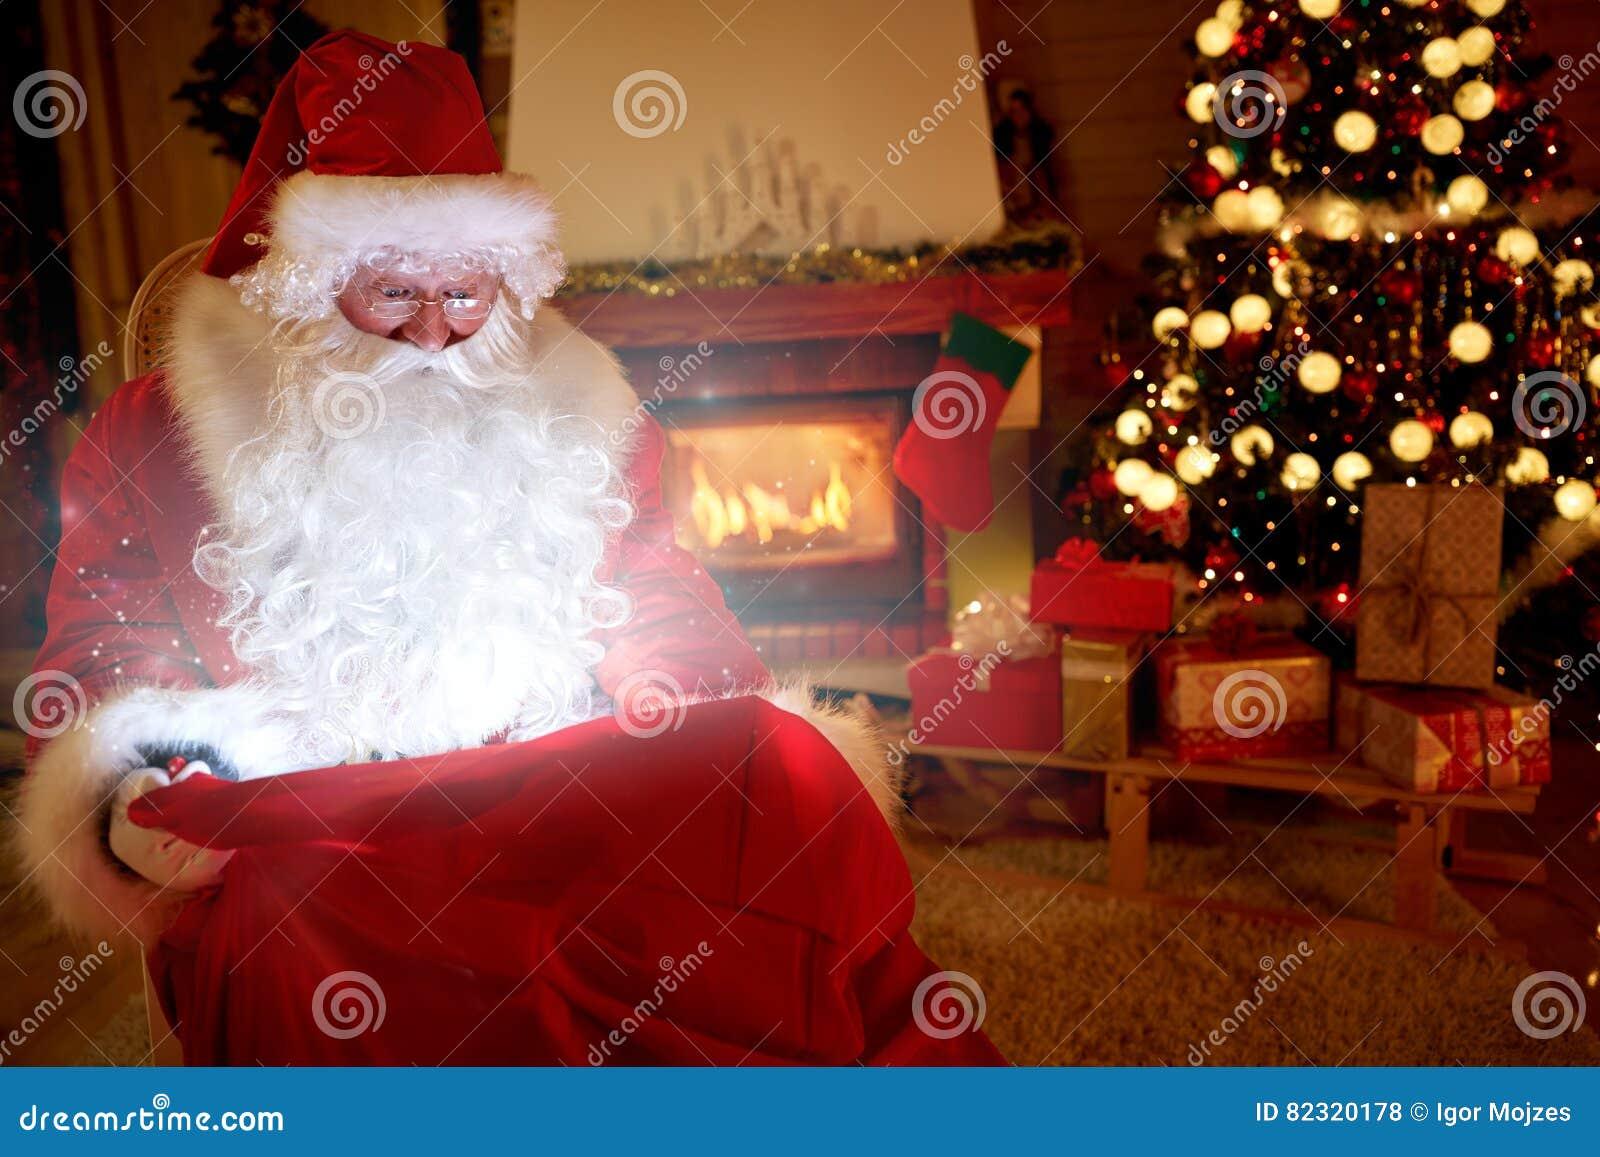 Santa Claus real traz a mágica do Natal